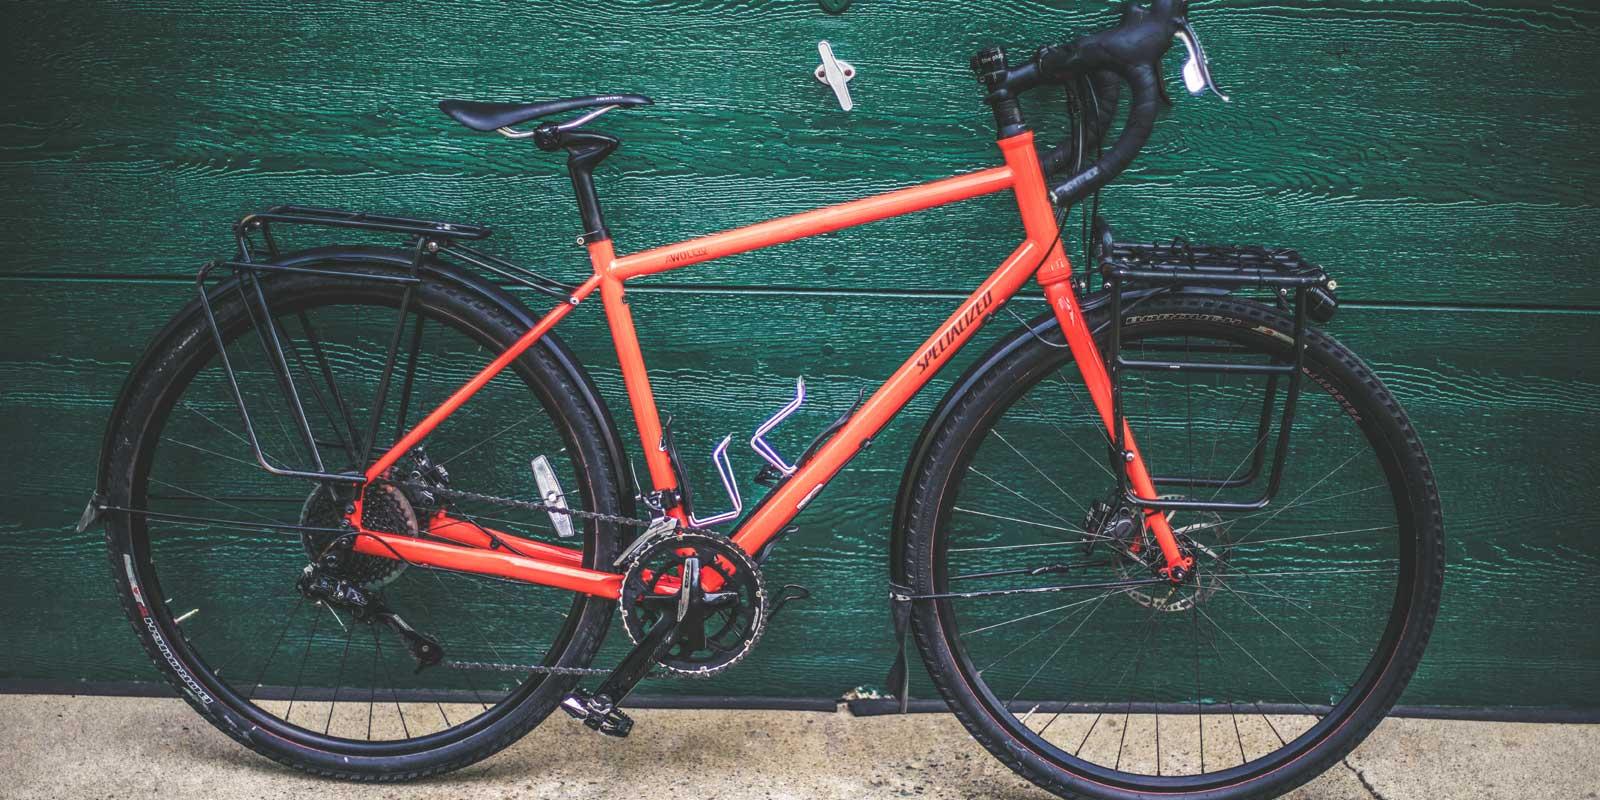 Bright orange bike set against a green wall